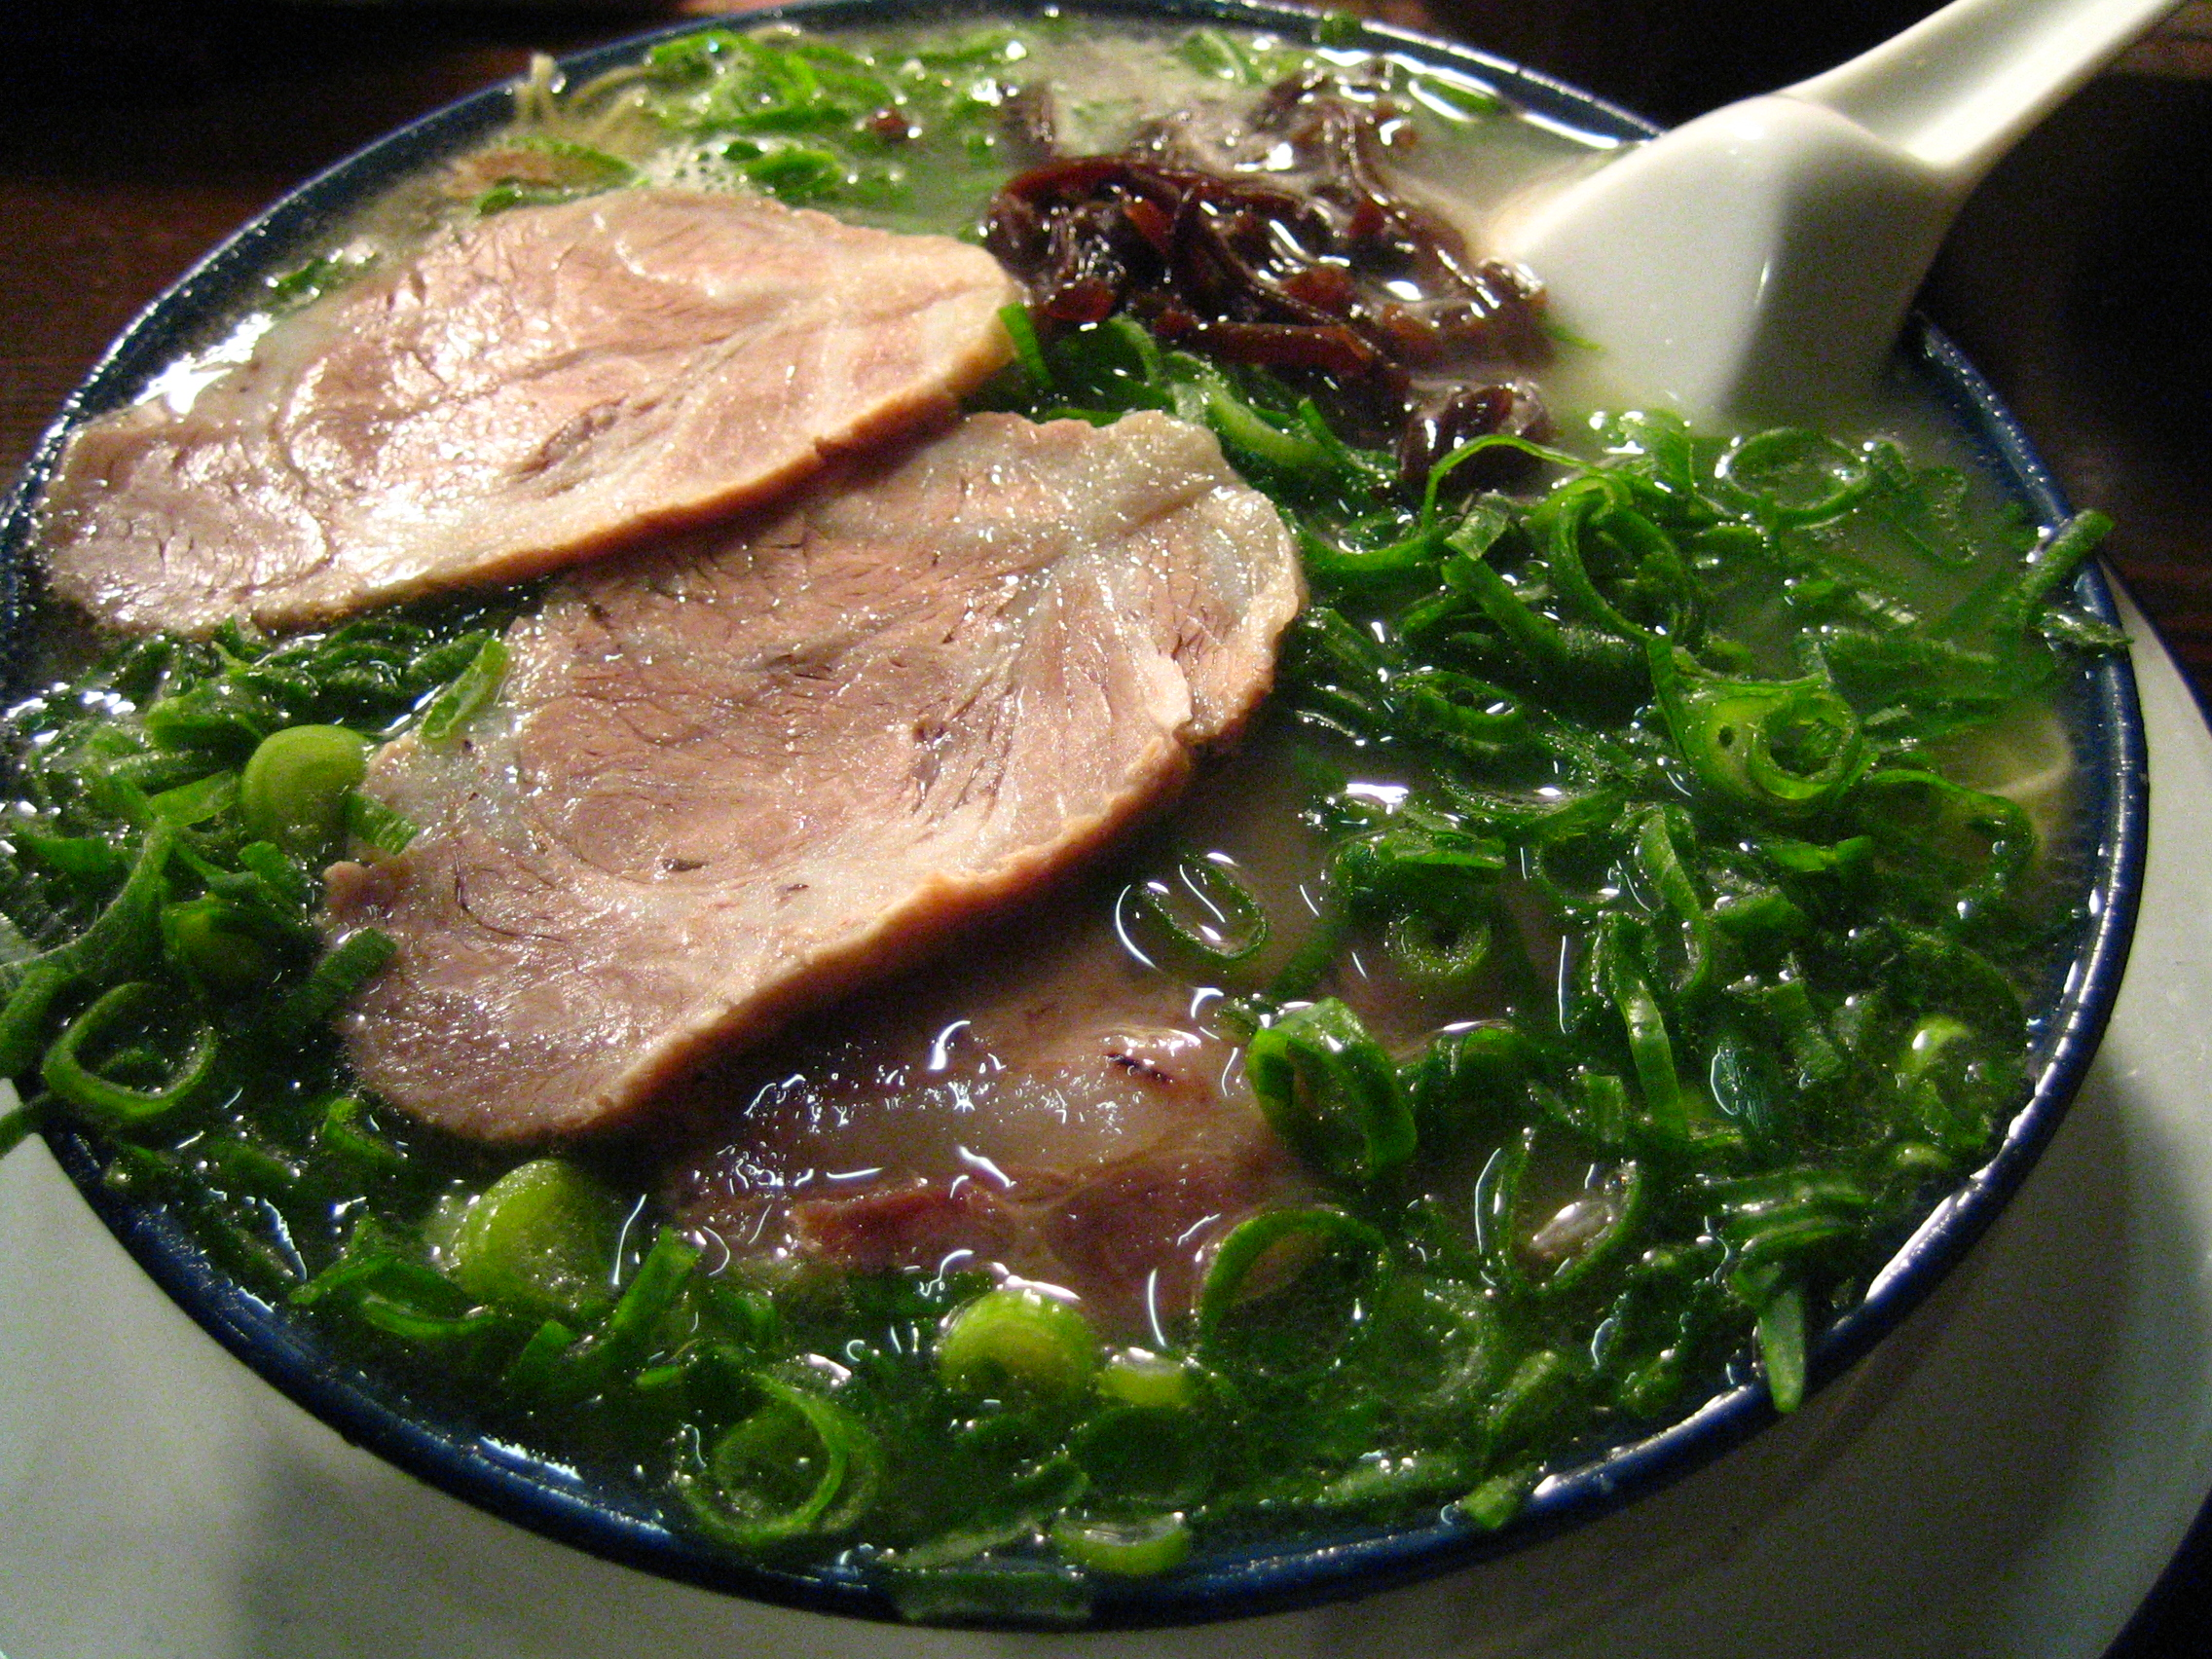 File:Hakata ramen with green onion by ayustety in Tokyo.jpg - Wikimedia Commons